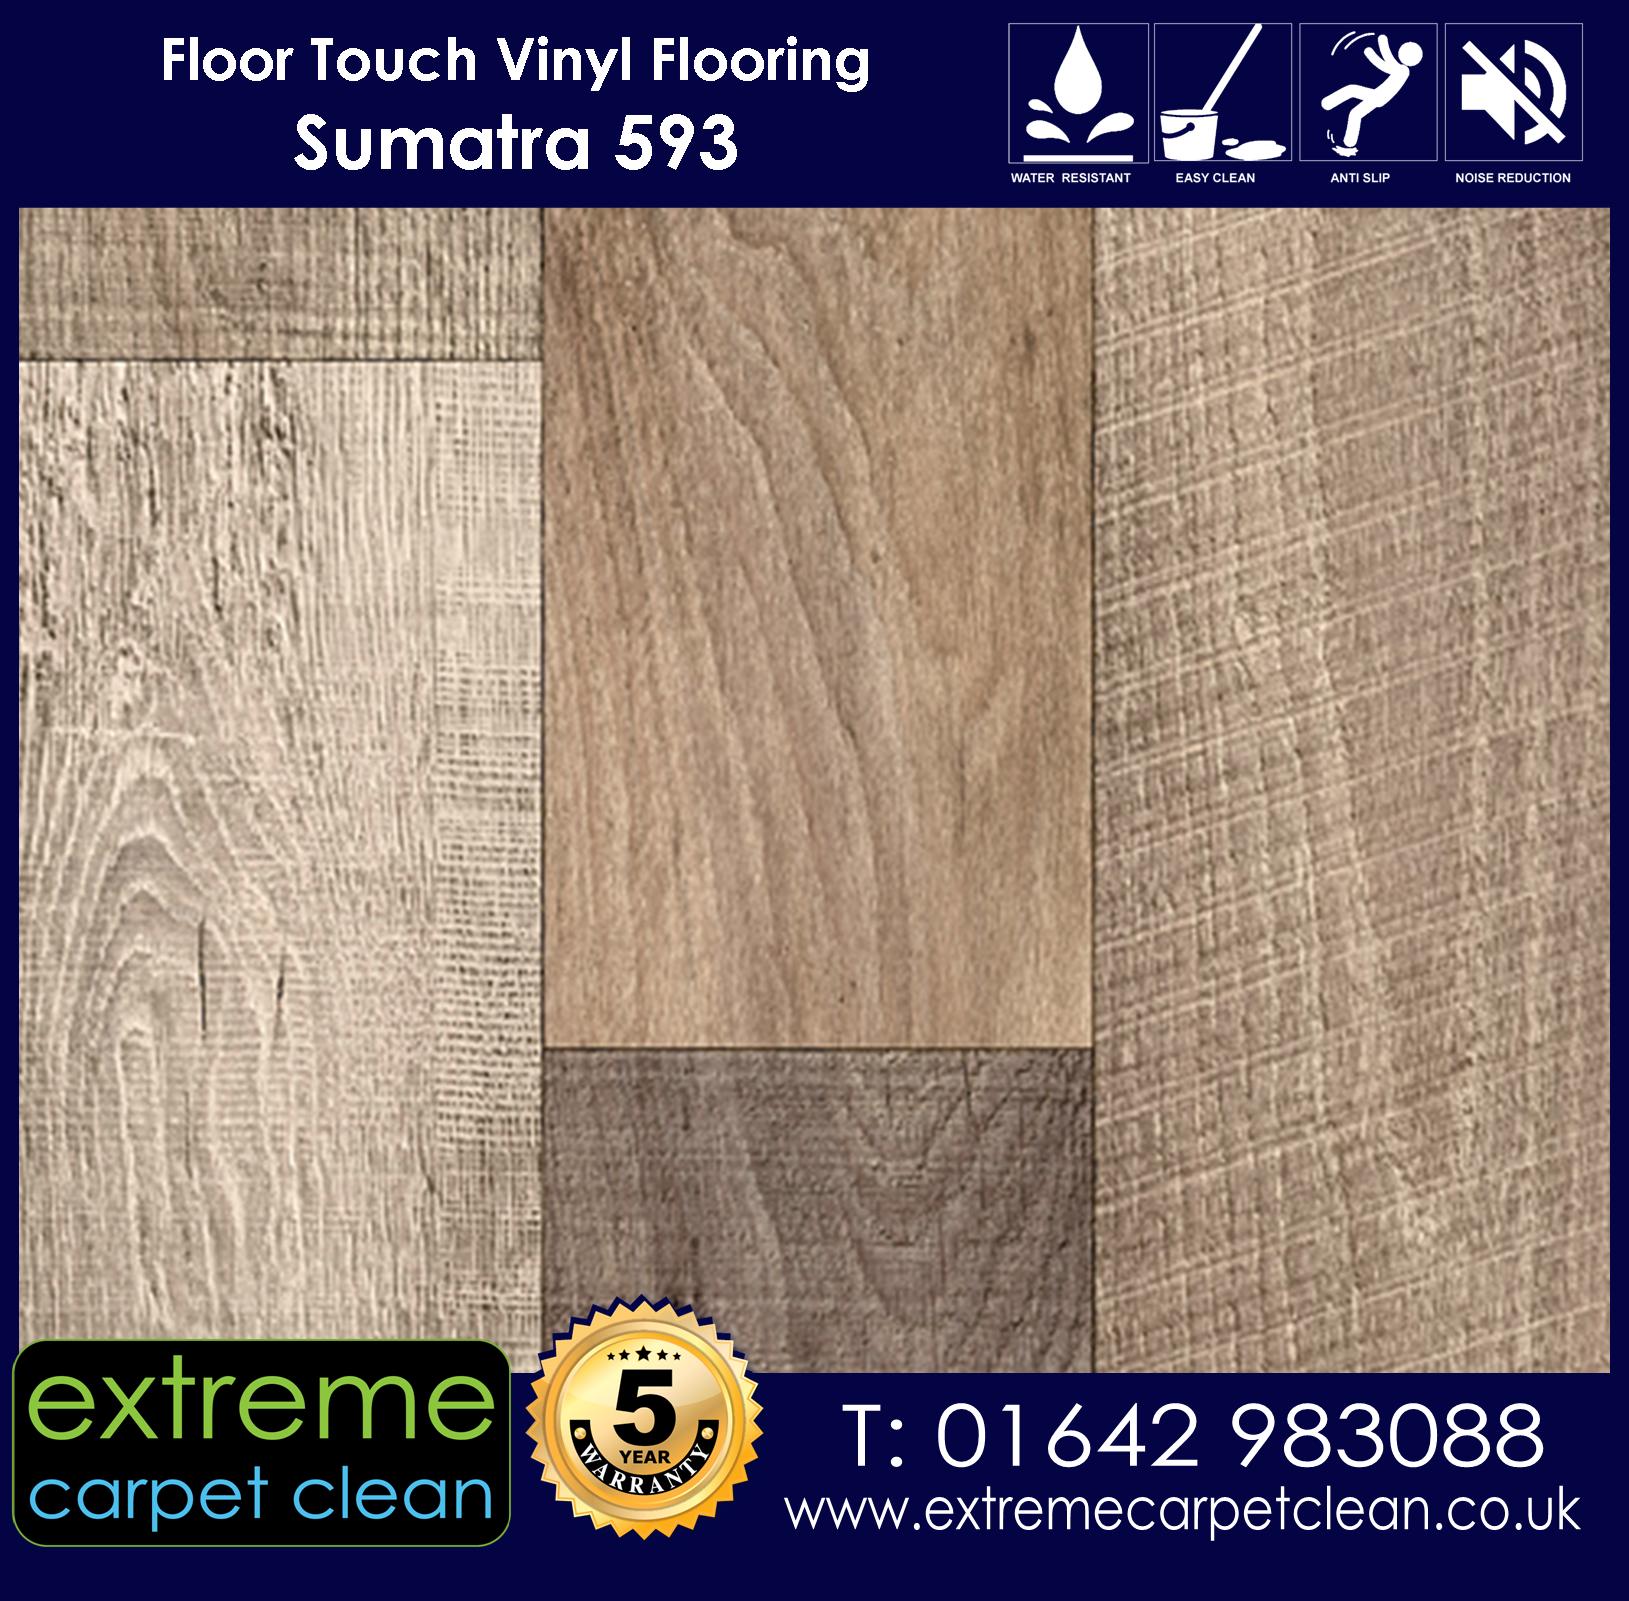 Extreme Carpet Clean. Vinyl Flooring. Sumatra 593